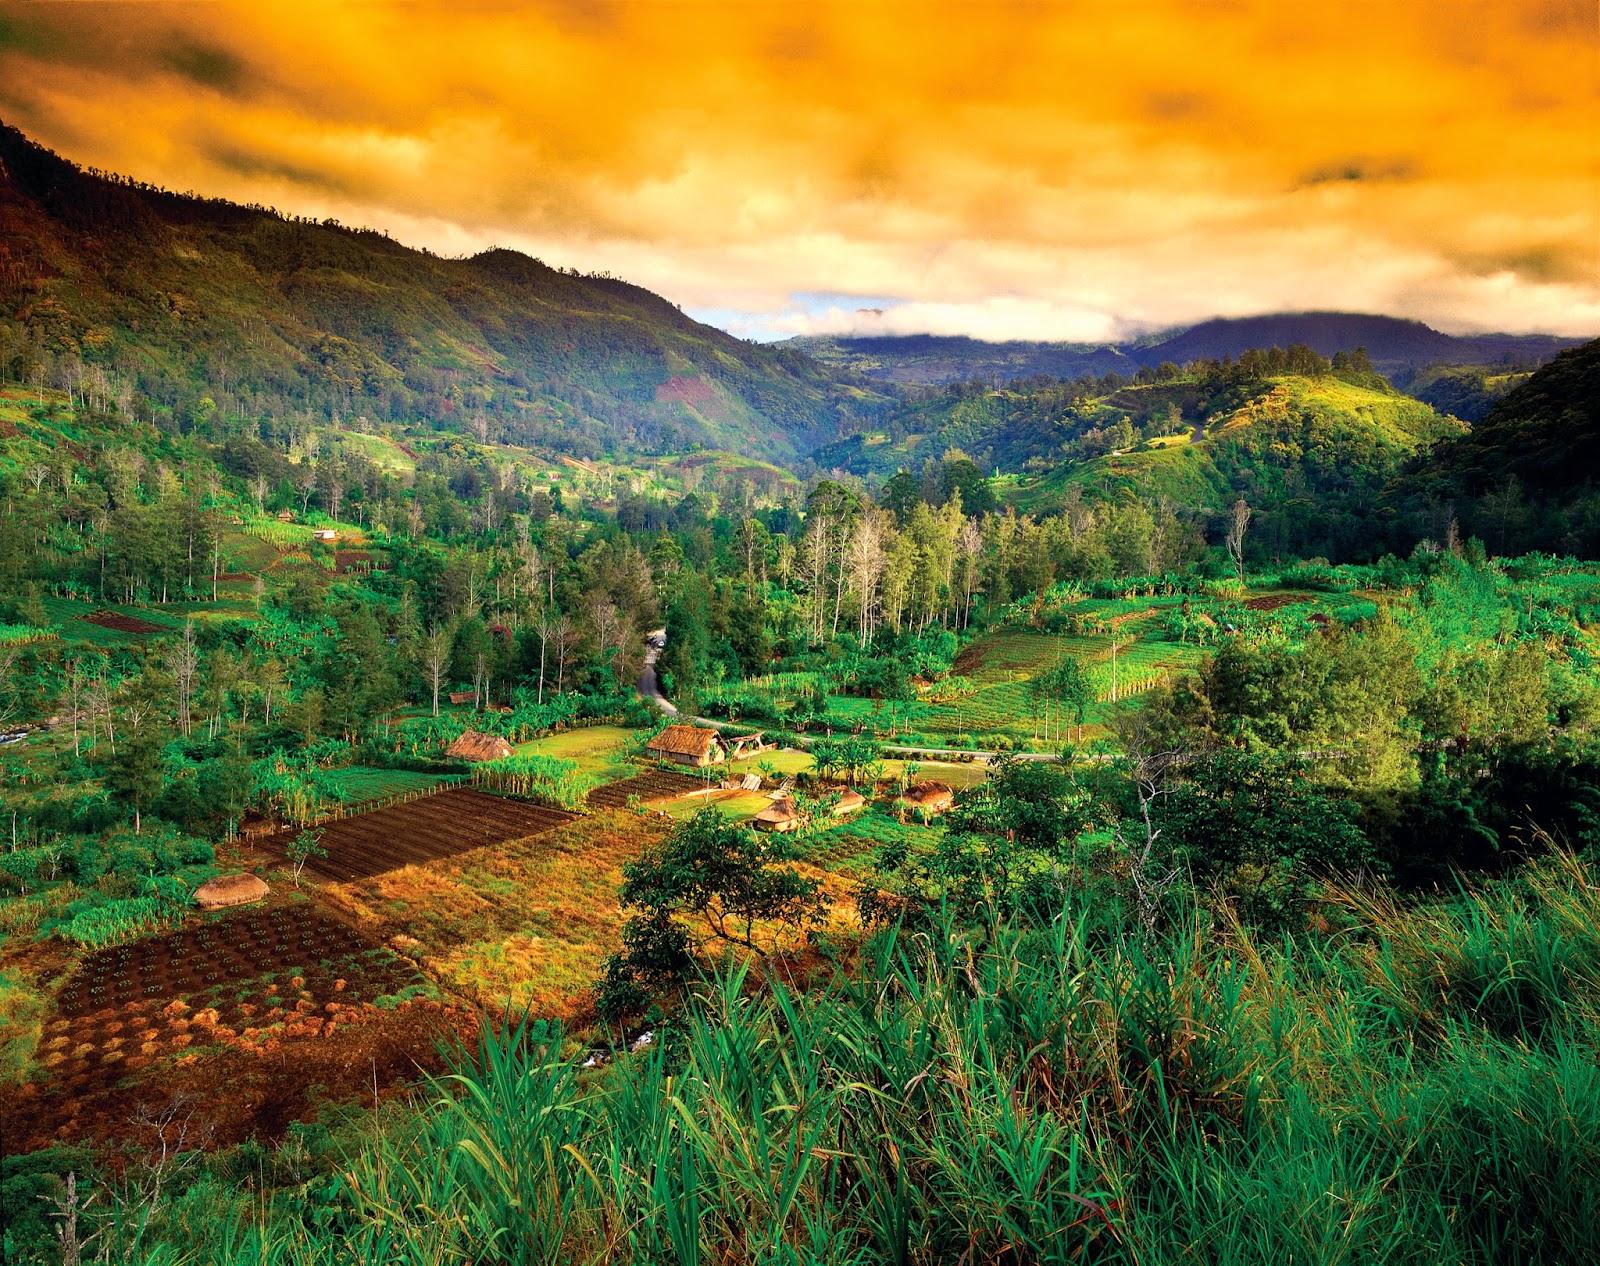 A RURAL SETTING NEAR MOUNT HAGEN - Papua New Guinea